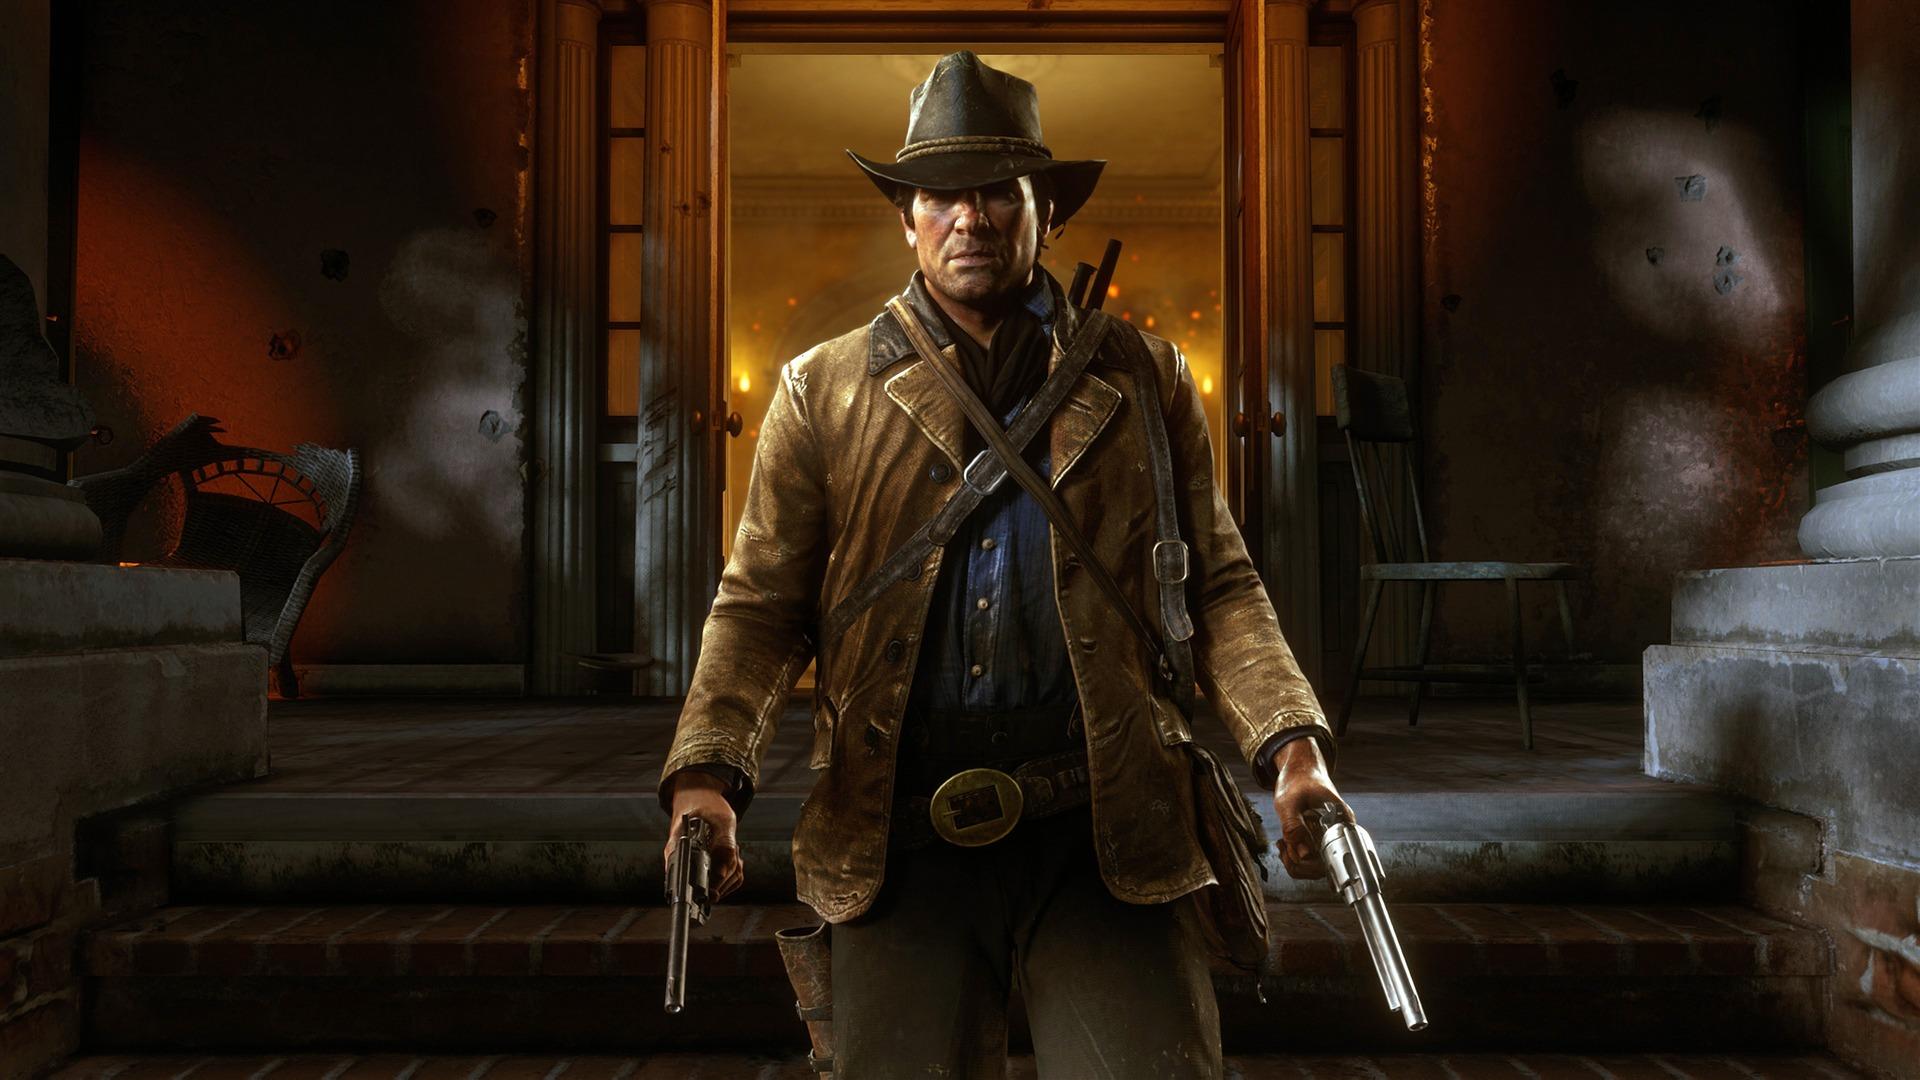 2018 Red Dead Redemption 2 Hd Juego Avance 10wallpapercom